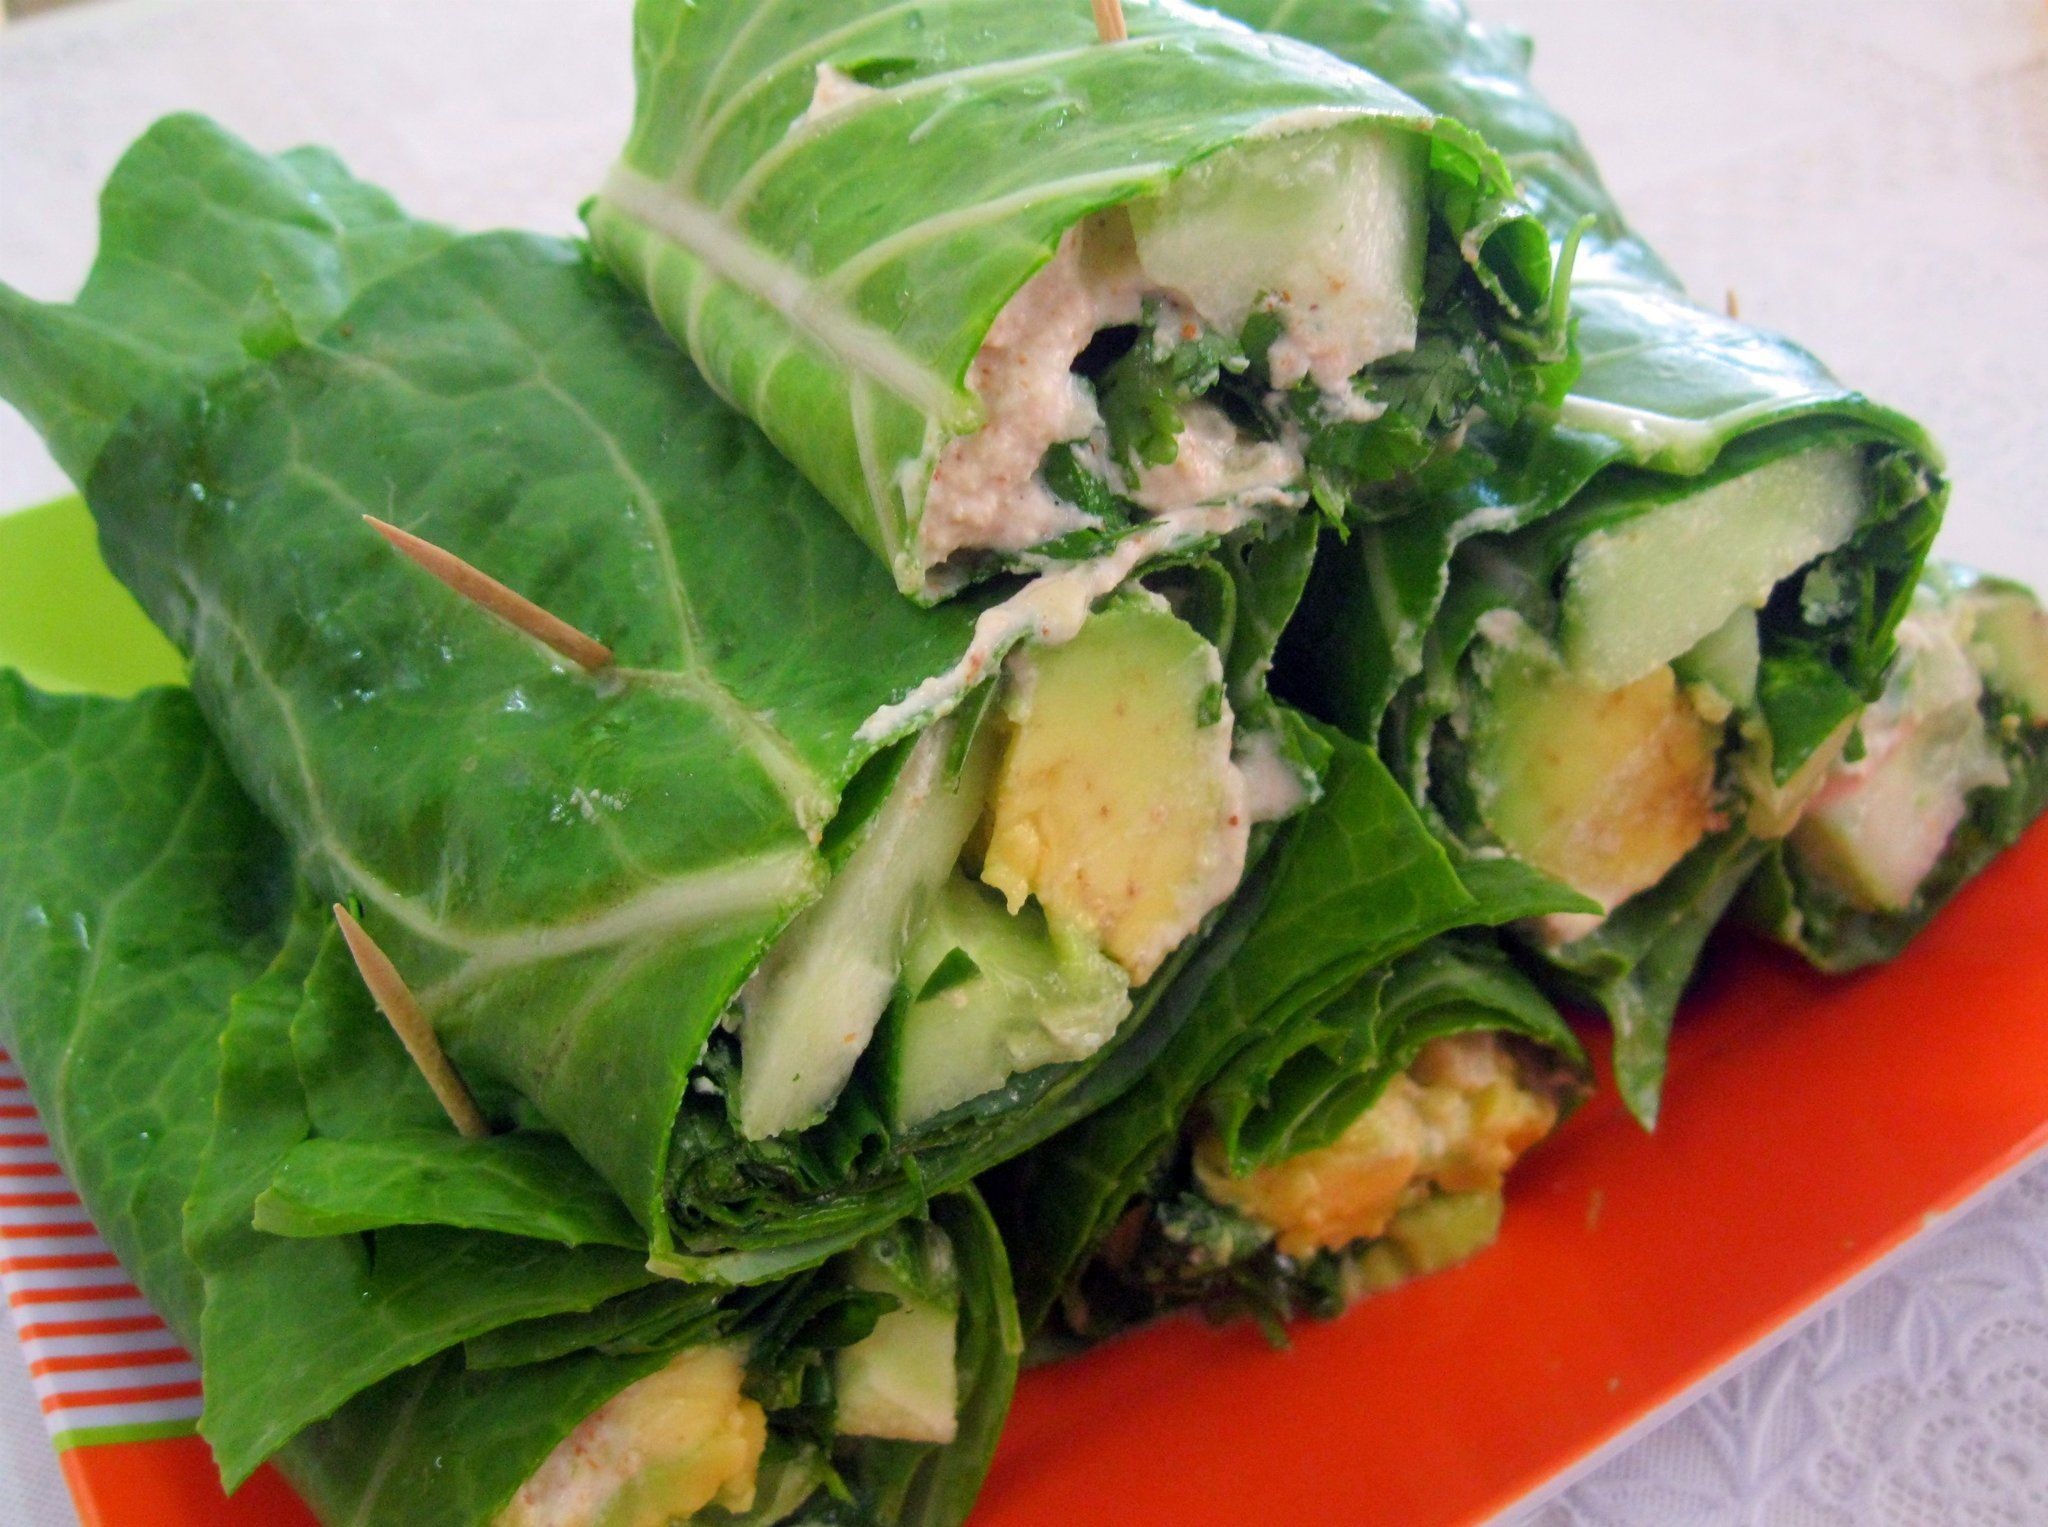 Basic veggie wraps from uncooking veggie wraps super easy basic veggie wraps from uncooking raw food recipesdiet recipesyummy recipesdiabetic forumfinder Images